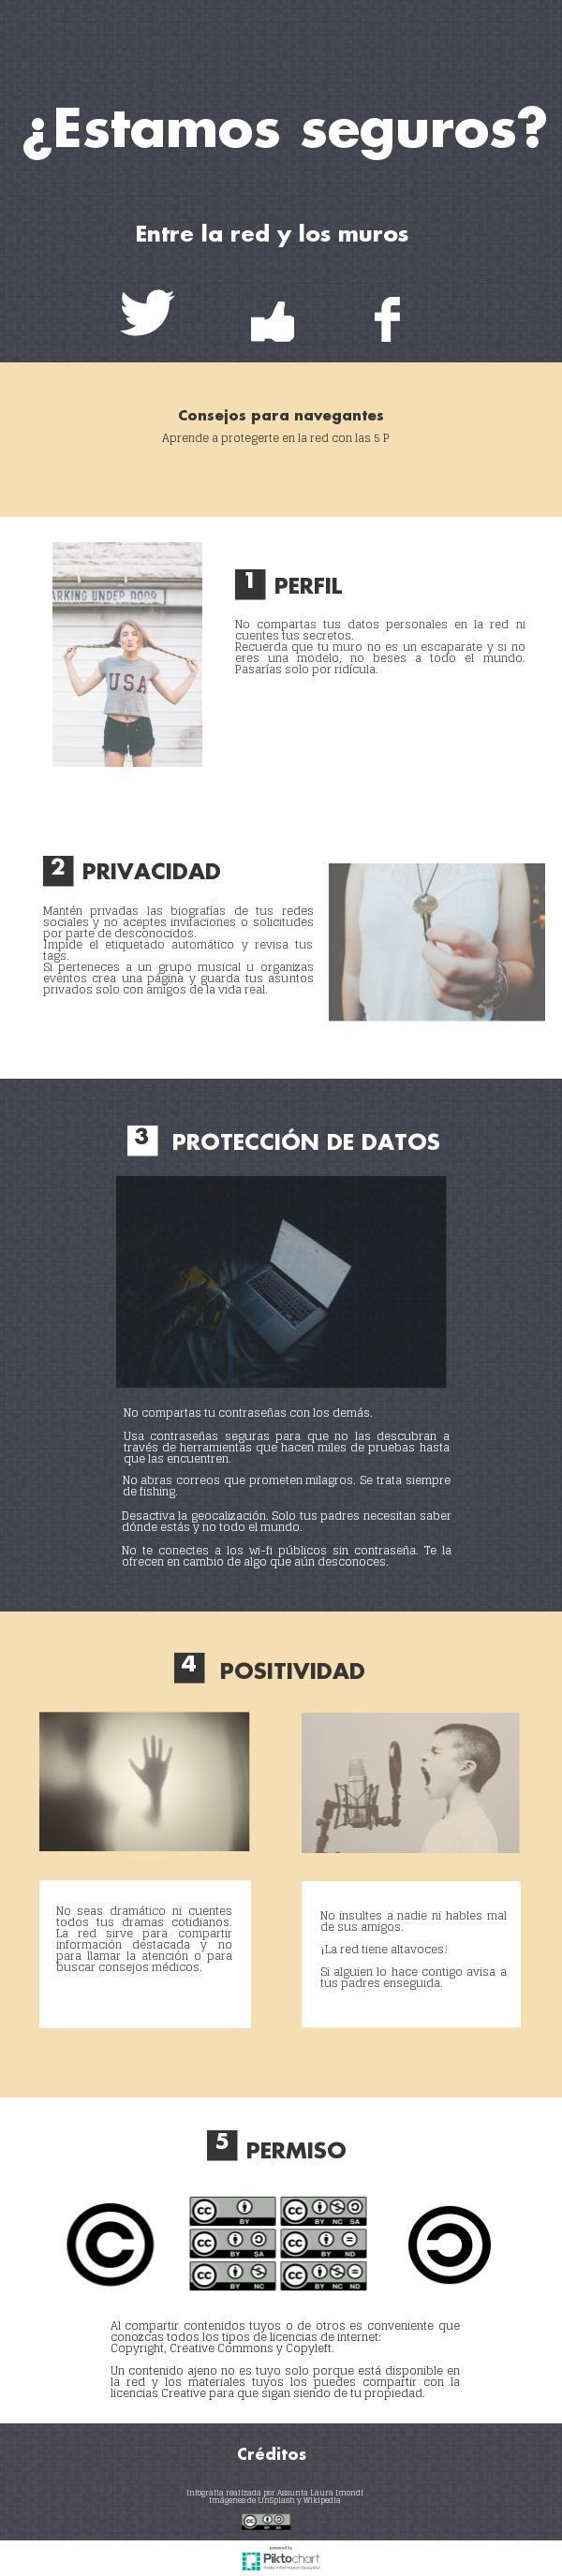 ¿Estamos seguros? | Piktochart Infographic Editor